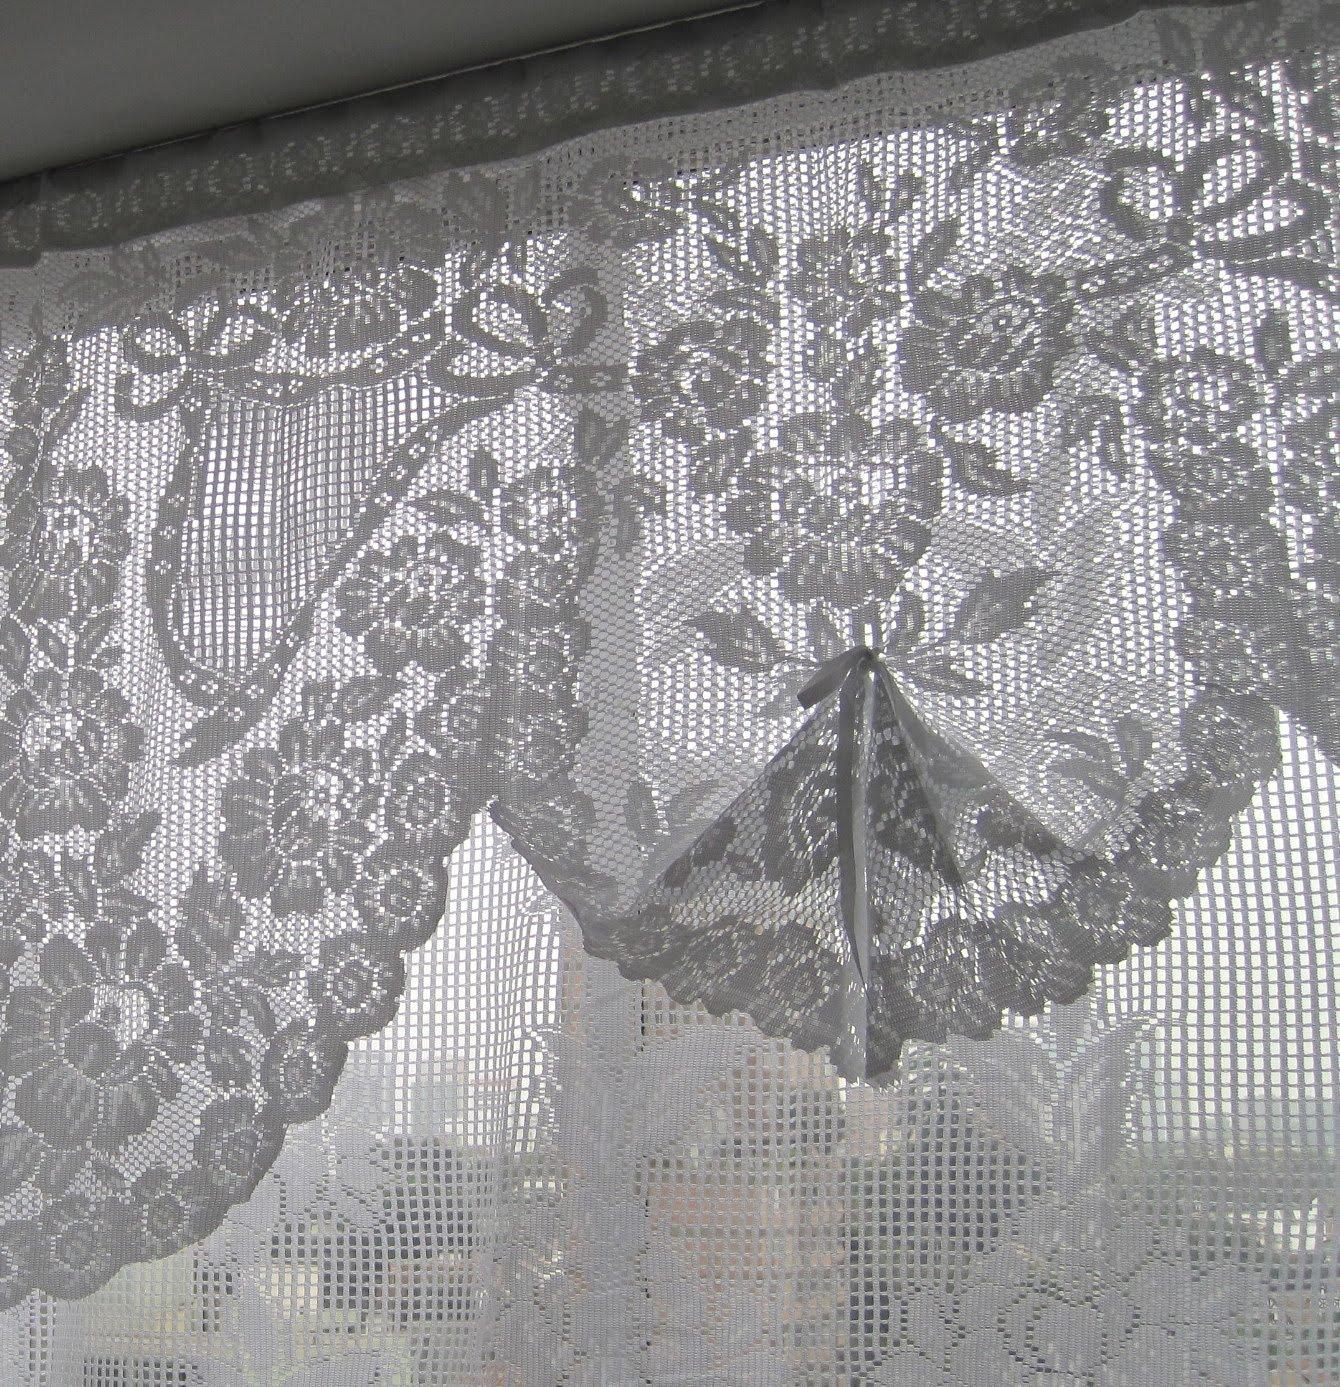 Atelier de charo arreglando cortinas fixing curtains - Cortinas ya hechas ...